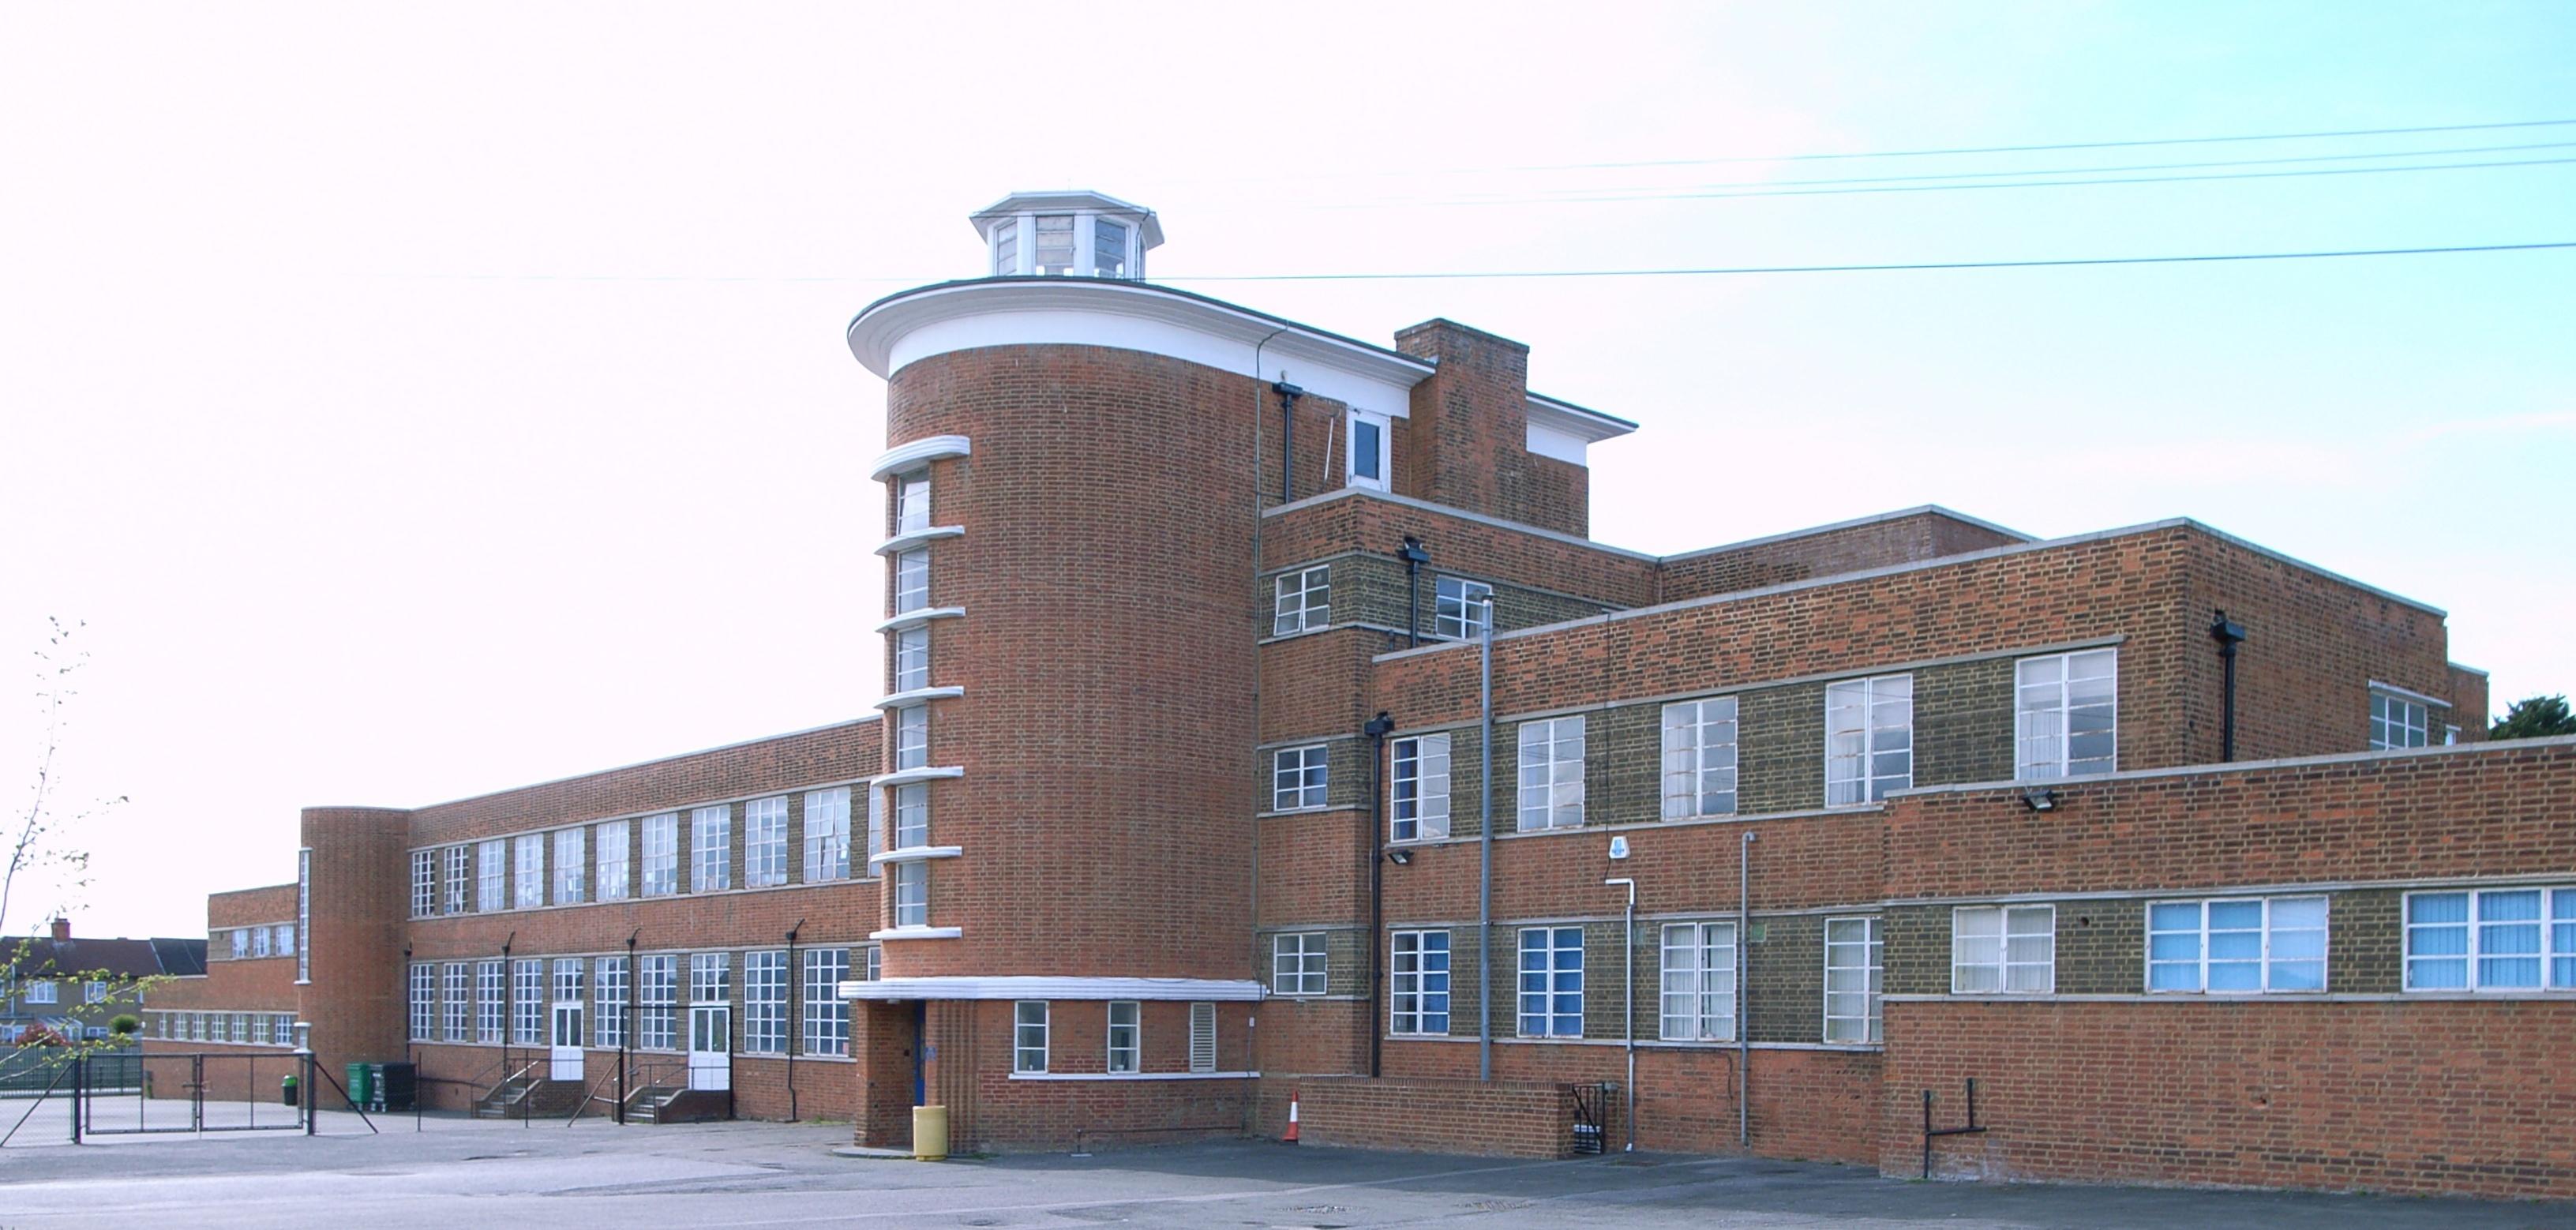 Lady Bankes Junior School  Flickr  Photo Sharing